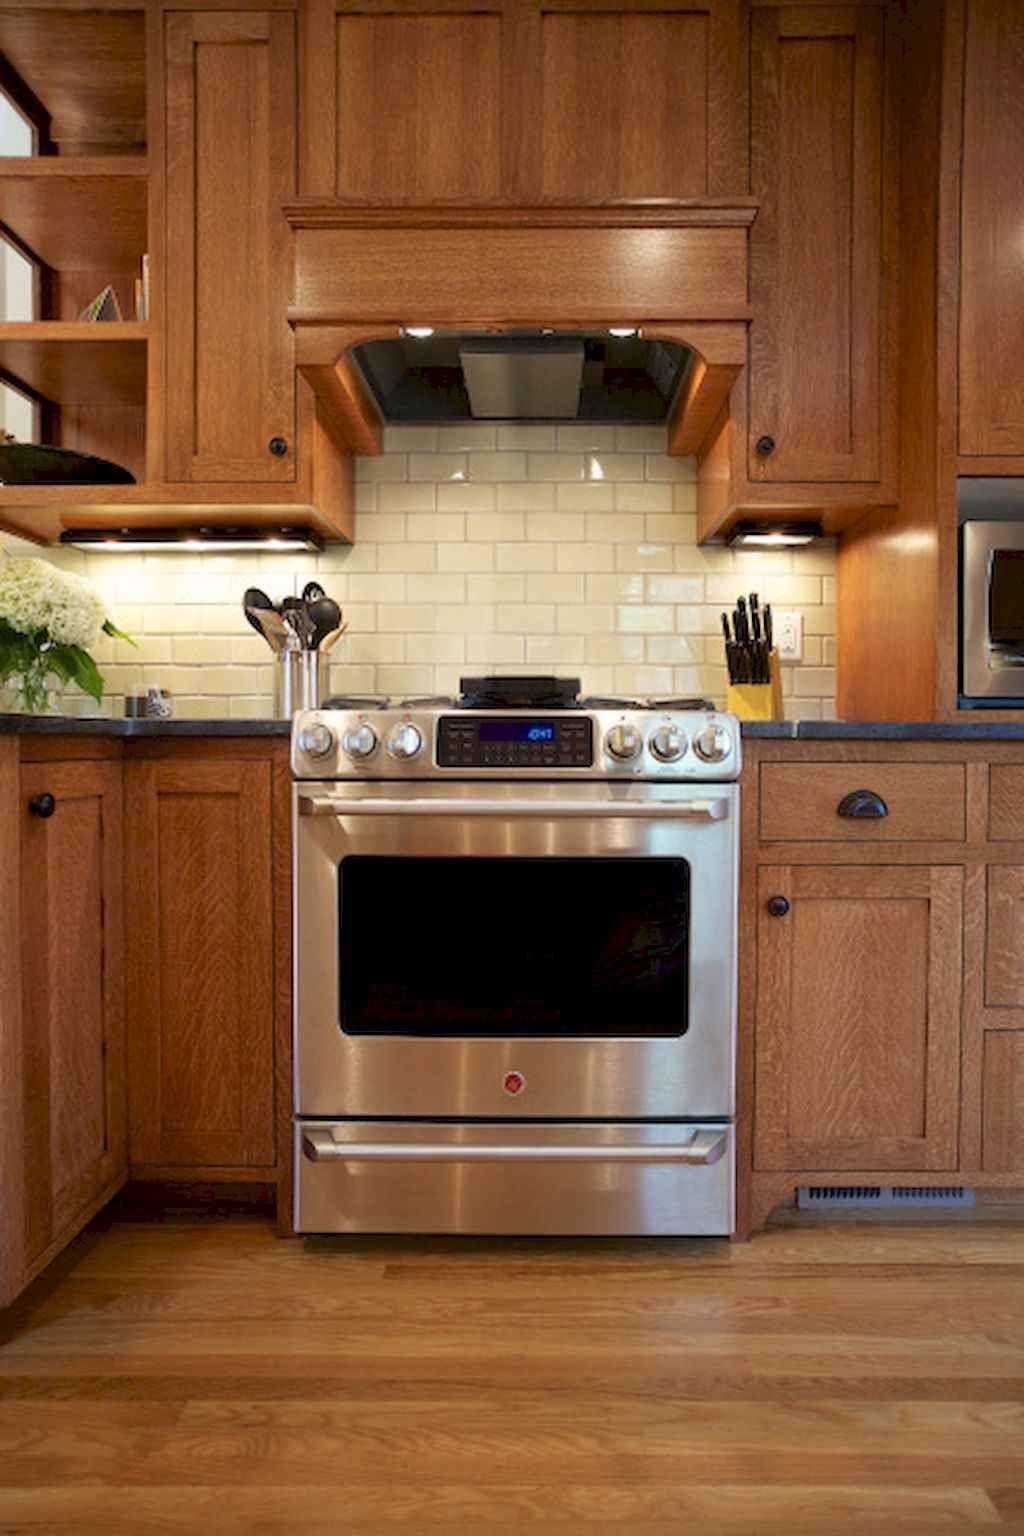 100 Best Oak Kitchen Cabinets Ideas Decoration For Farmhouse Style 75 Oak Kitchen Honey Oak Cabinets Oak Kitchen Cabinets